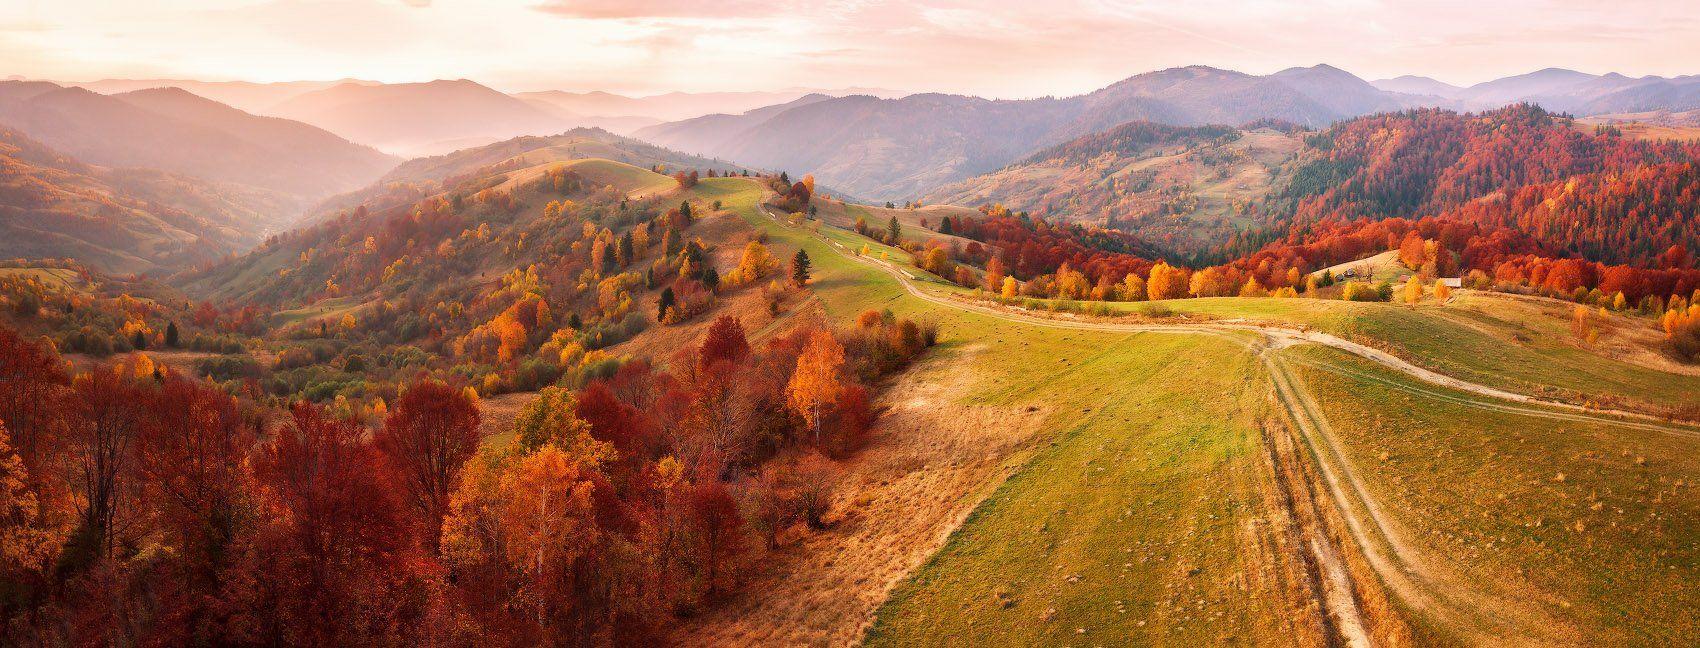 вечер, горы, дронофото, закарпатье, закат, карпаты, октябрь, осень, украина, Вейзе Максим